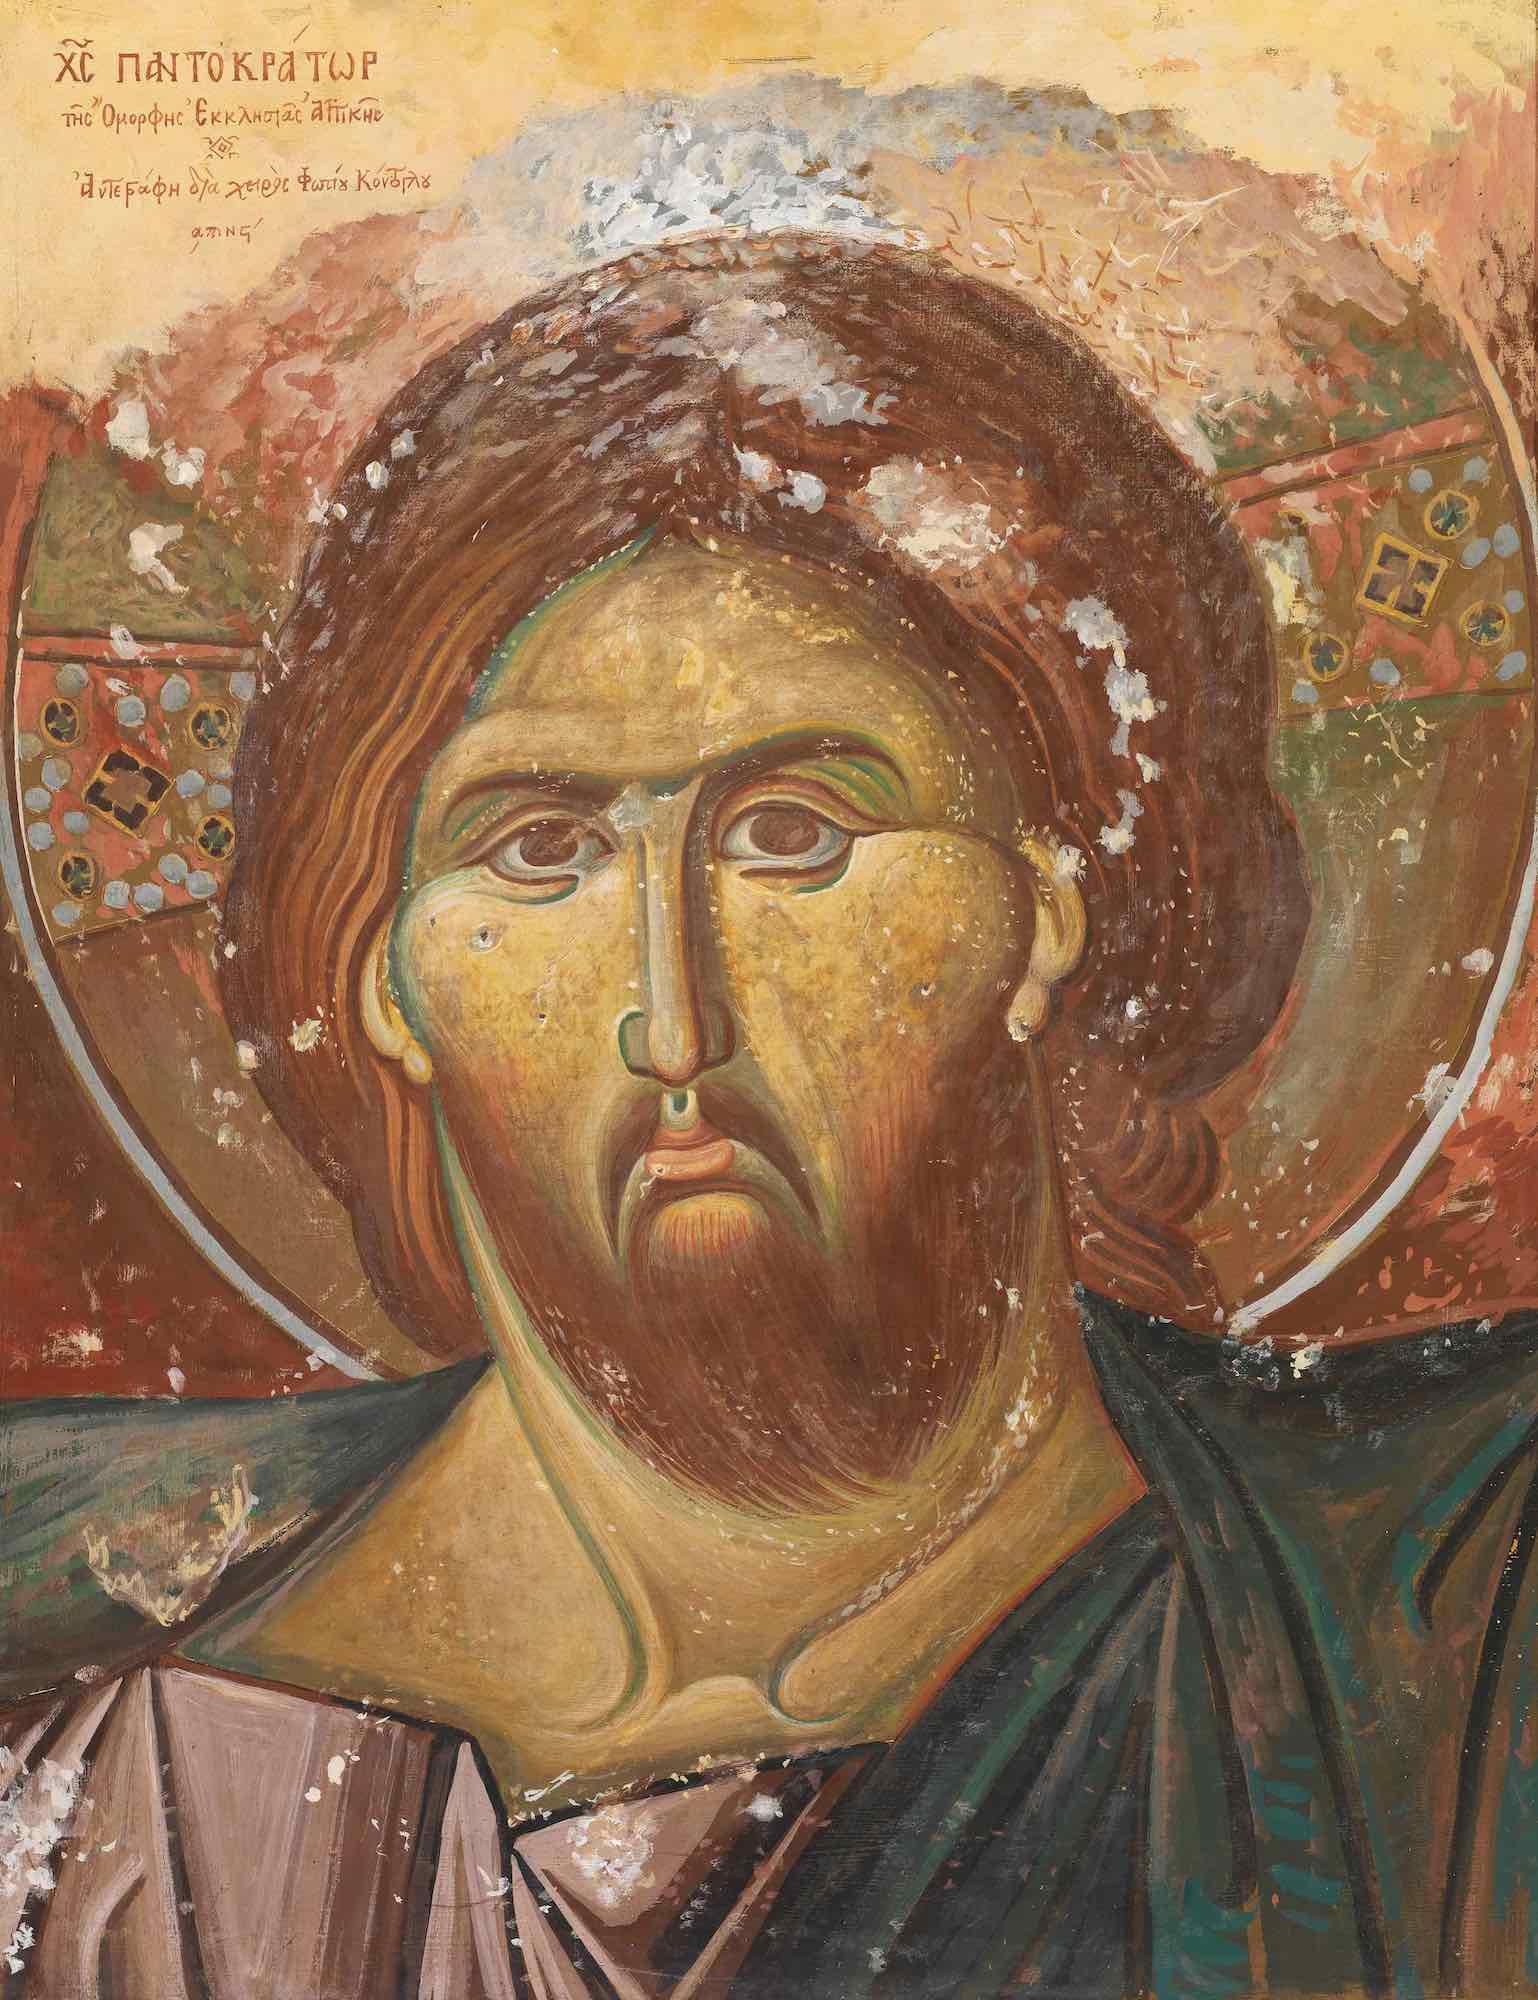 Fotis Kontoglou   Christ Pantocrator